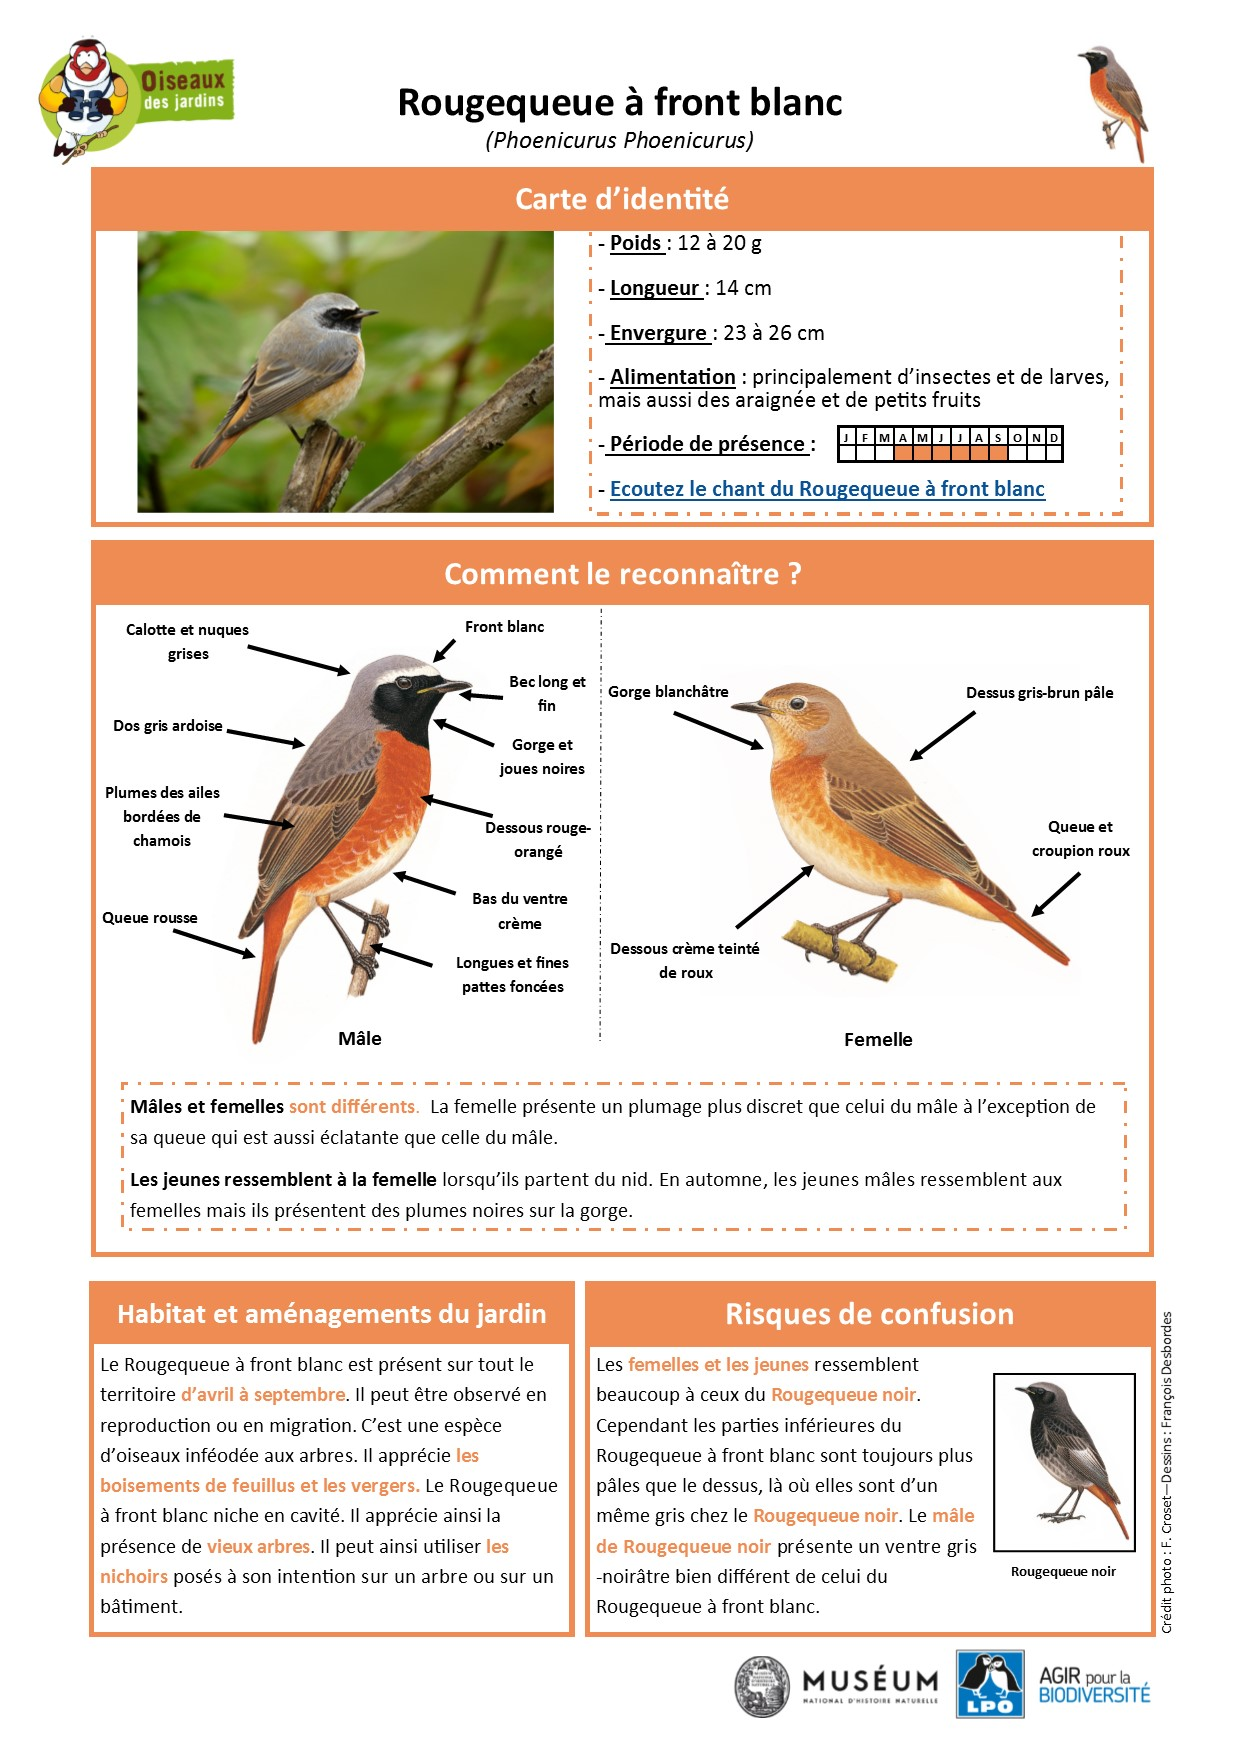 https://cdnfiles1.biolovision.net/www.oiseauxdesjardins.fr/userfiles/Fichesespces/FicheespceRQFB.pdf